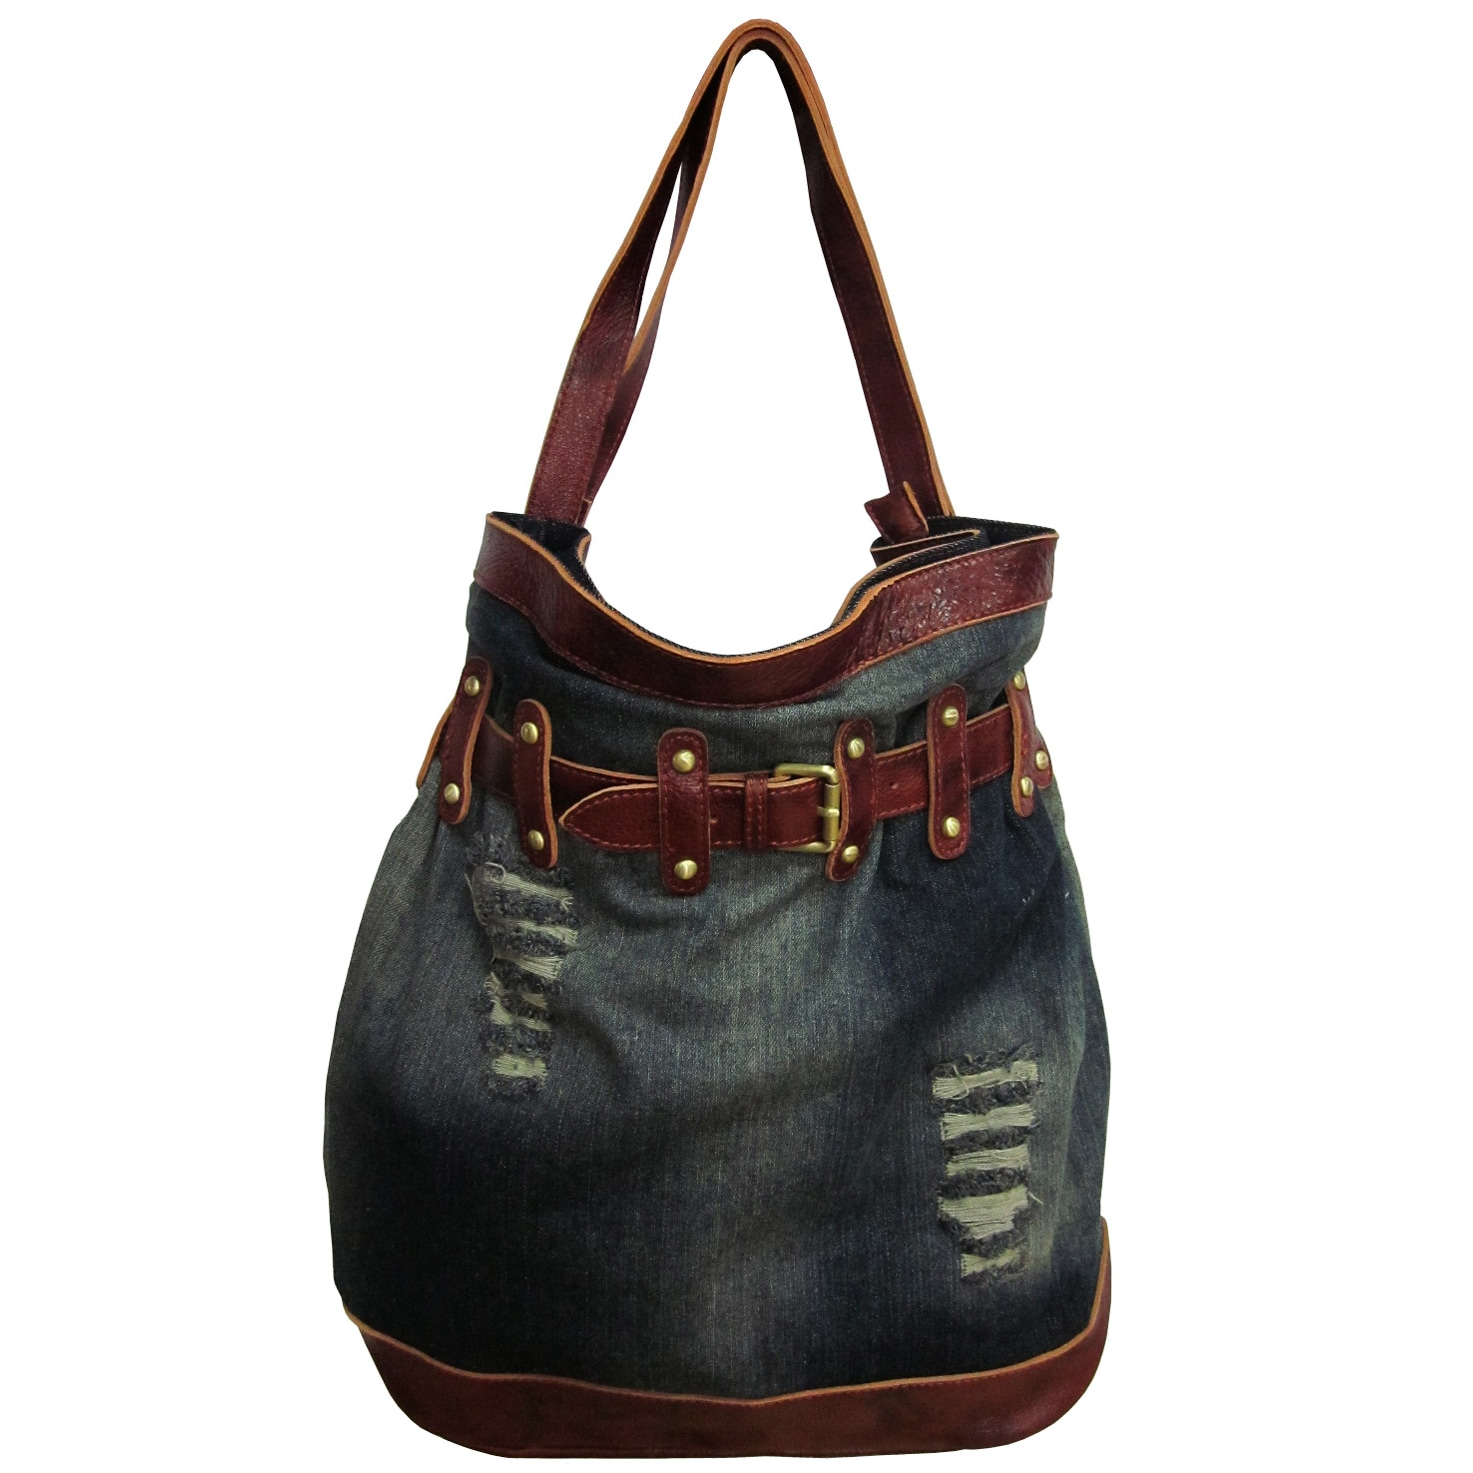 Amerileather 'Damian' Denim And Leather Shoulder Bag 44